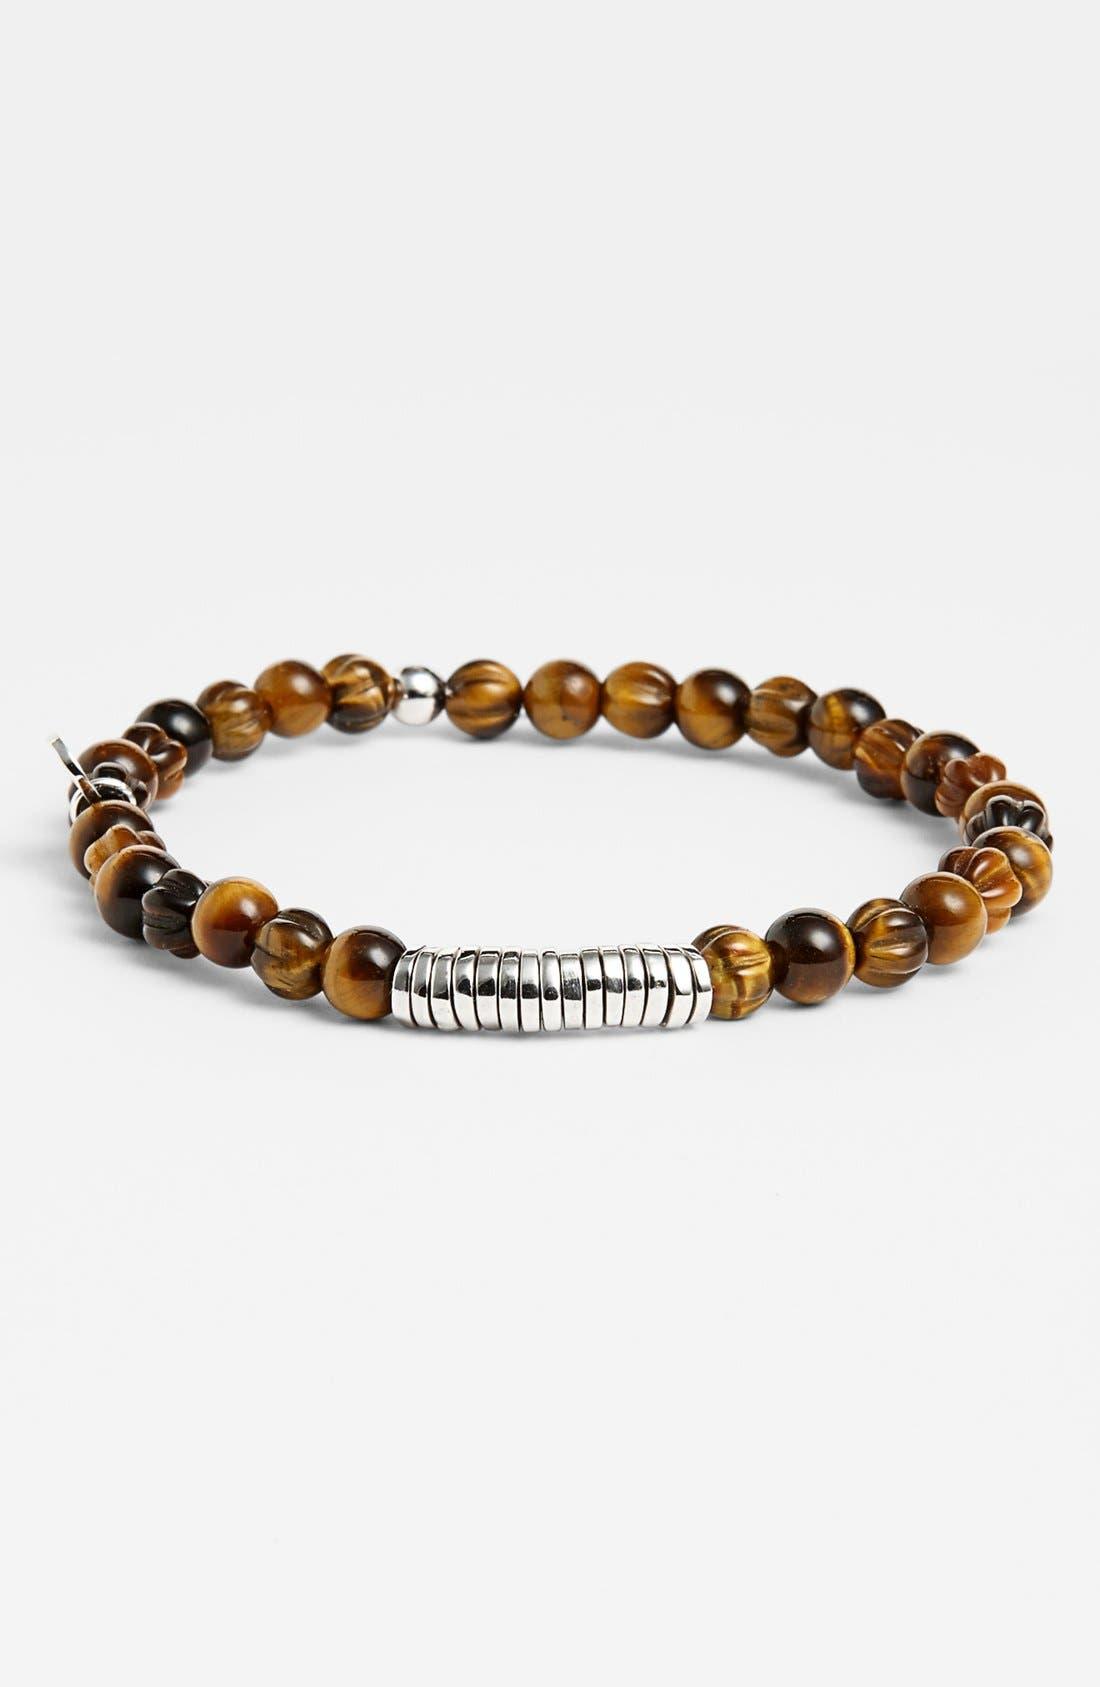 Main Image - Tateossian Bead Bracelet